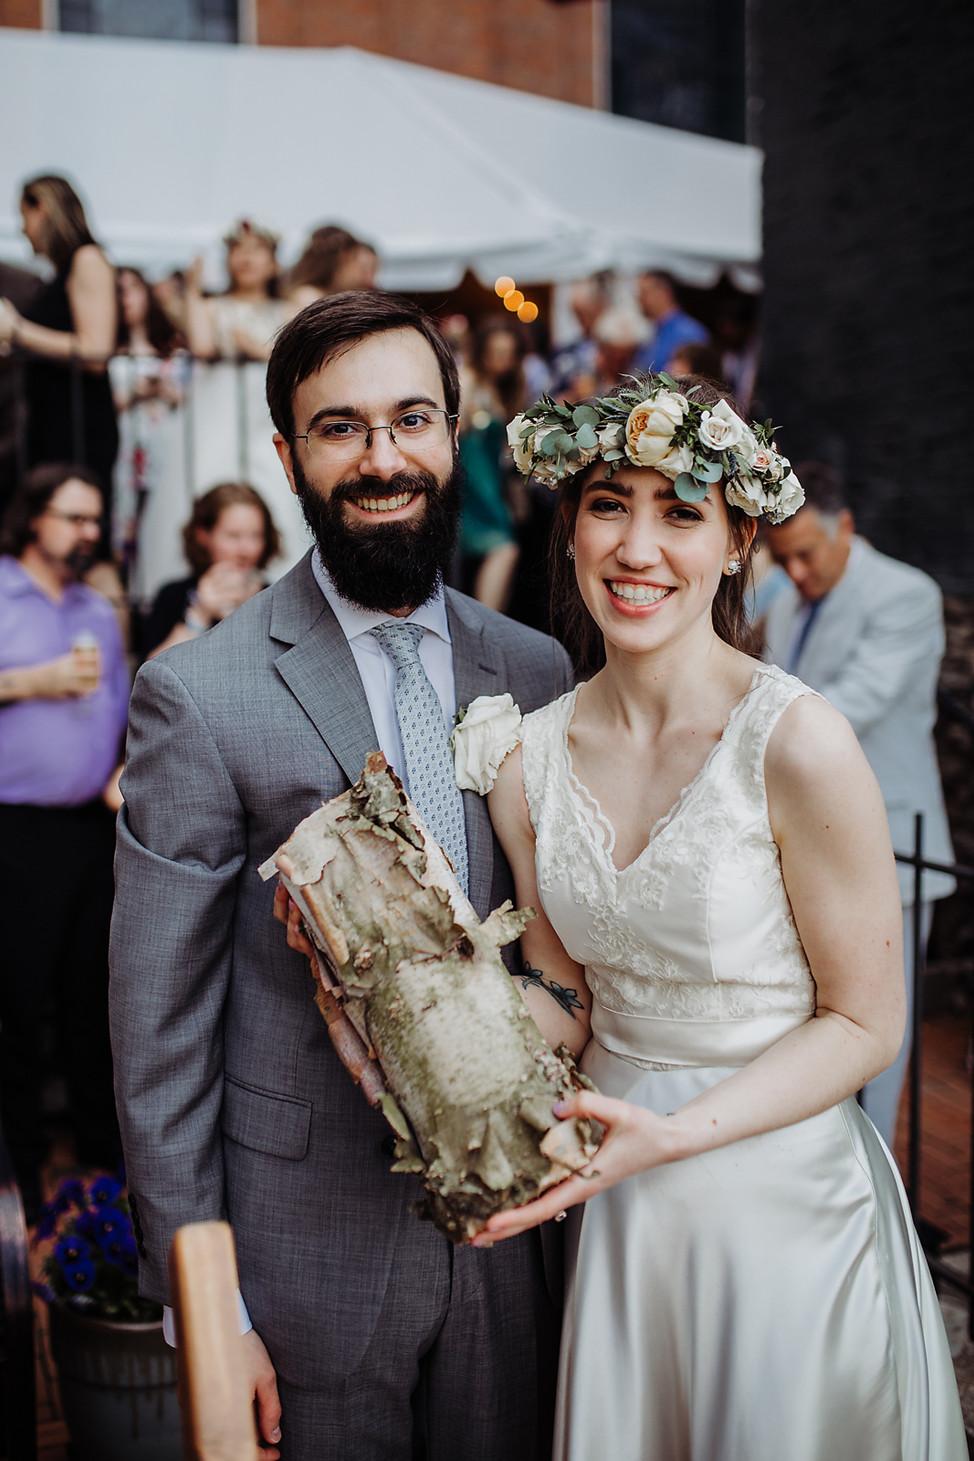 Martin + Sarah || Wedding at Bell Event Center, Cincinnati